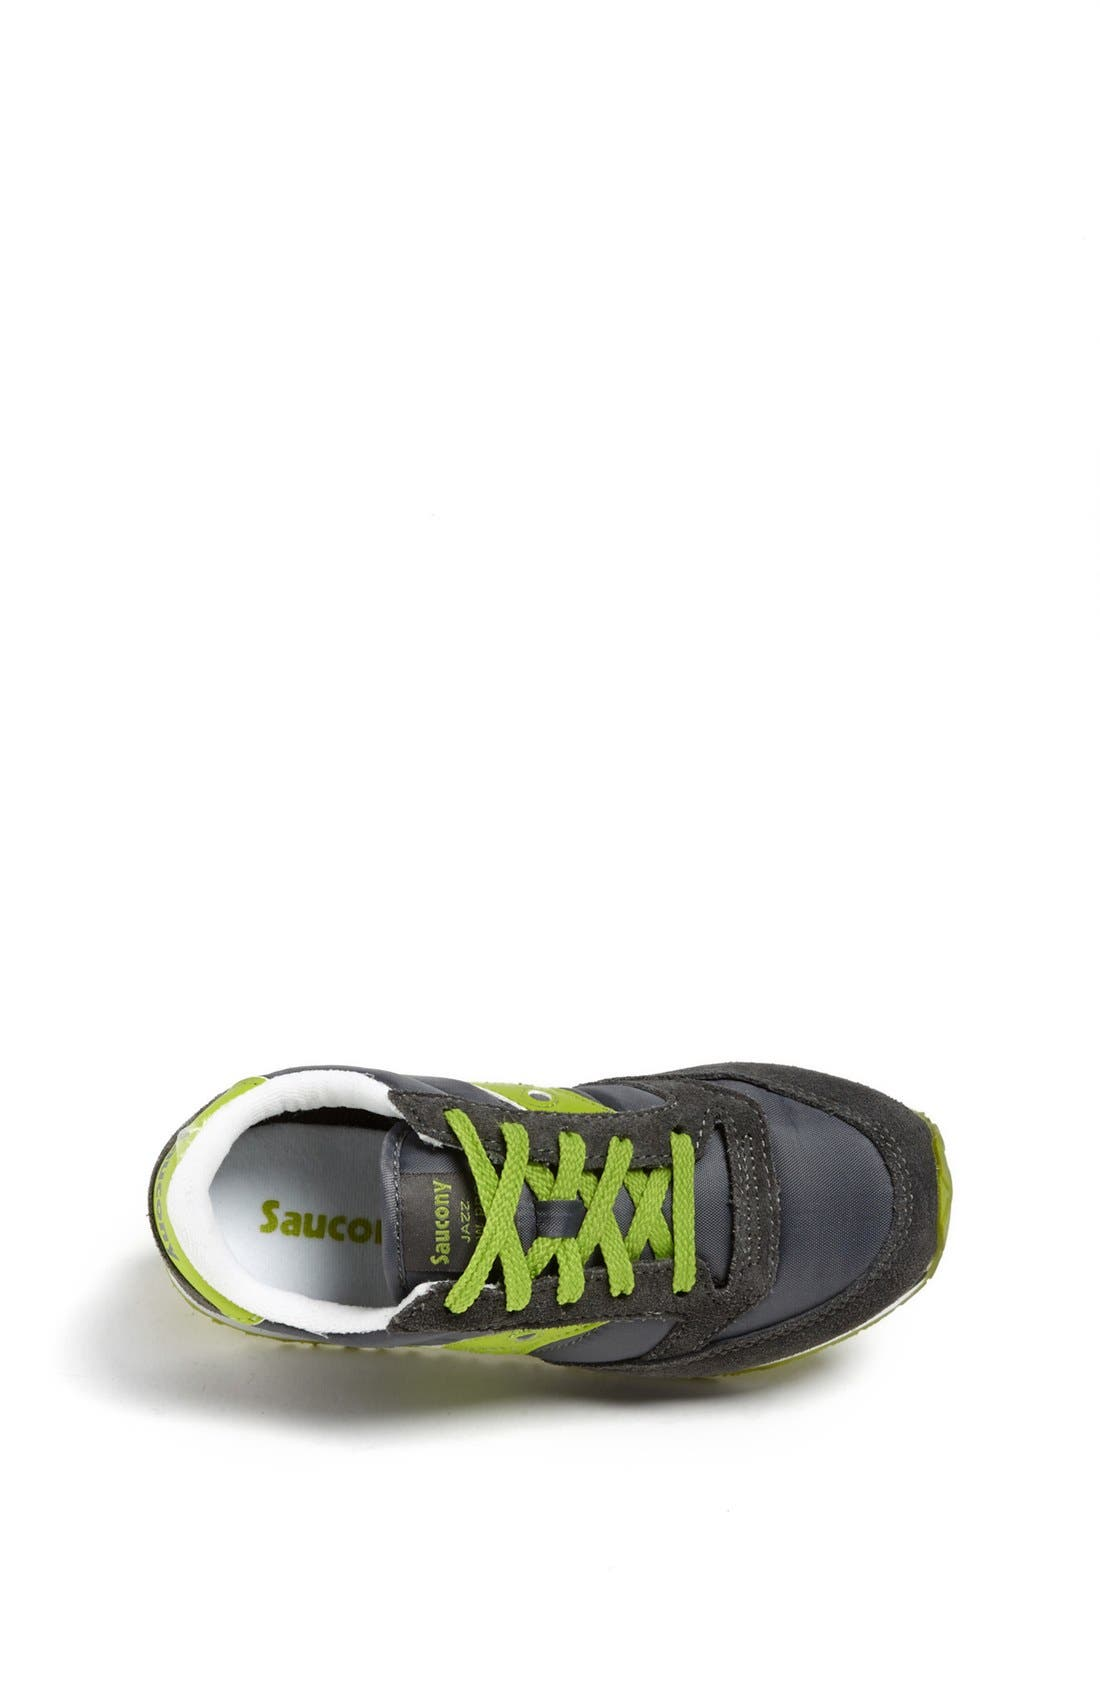 Alternate Image 3  - Saucony 'Jazz - LowPro' Sneaker (Toddler & Little Kid)